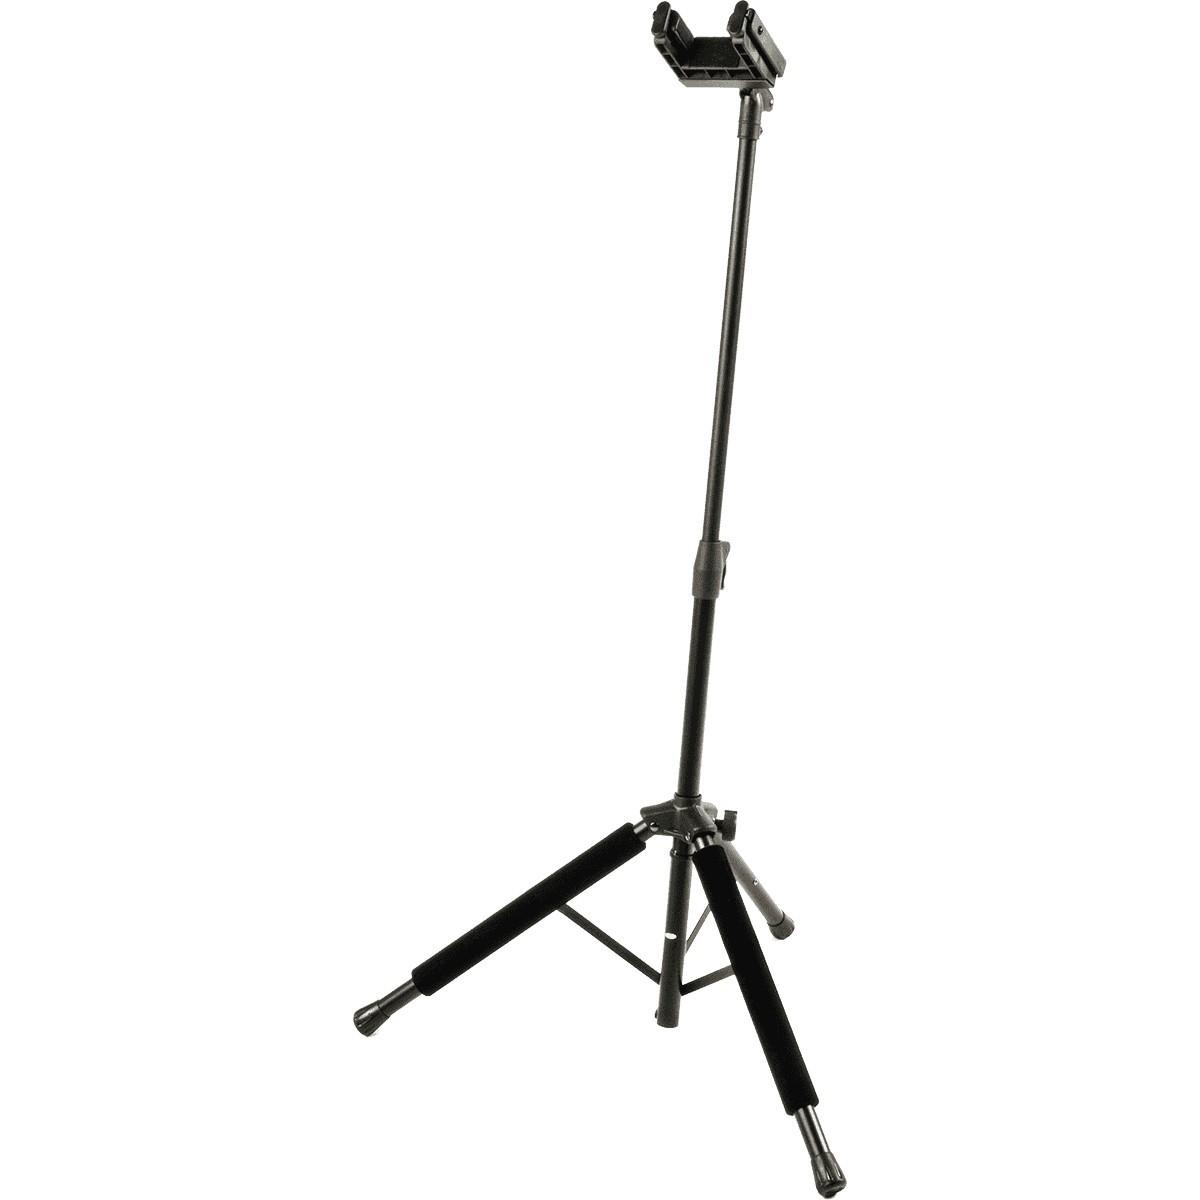 QUIK LOK GS508 Stand Guitare Universel Tête Pliable